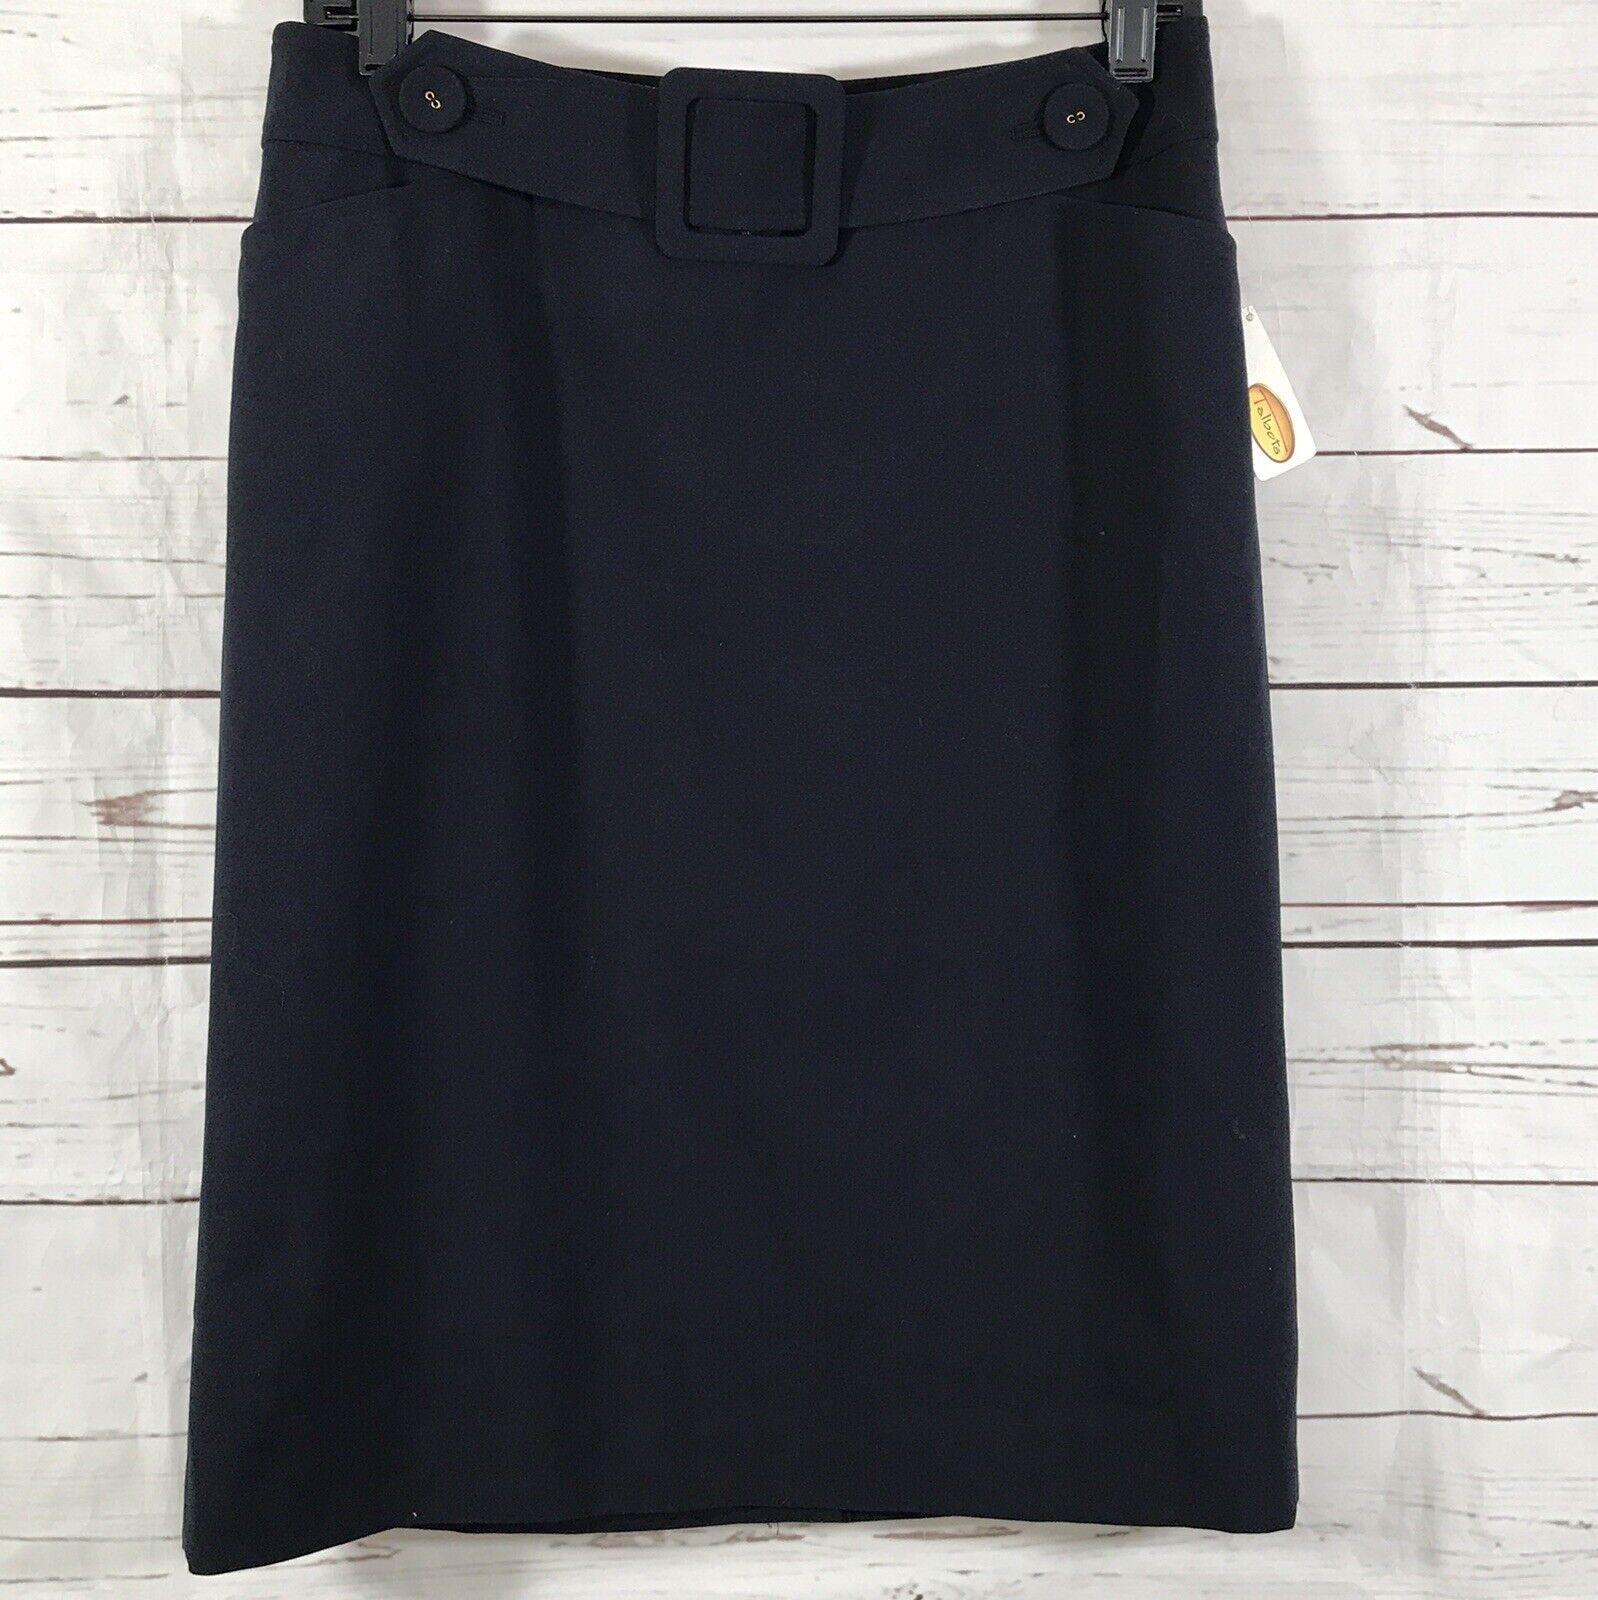 Talbots Pencil Straight Skirt Size 4 Navy bluee Lined Slit Career NWT